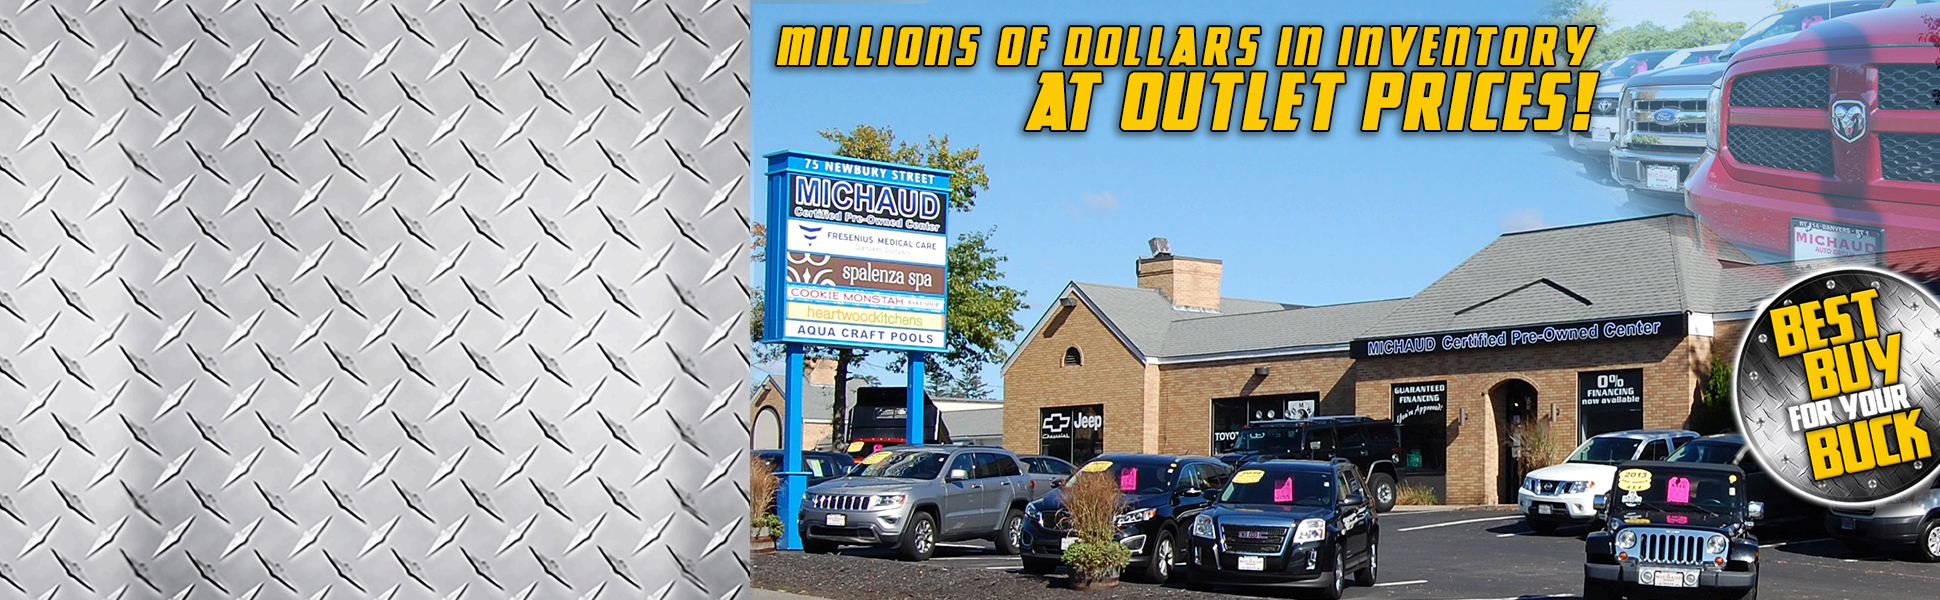 Banner Image Banner Image & Quality Used Cars Trucks u0026 SUVs for Sale | Financing for All ... markmcfarlin.com